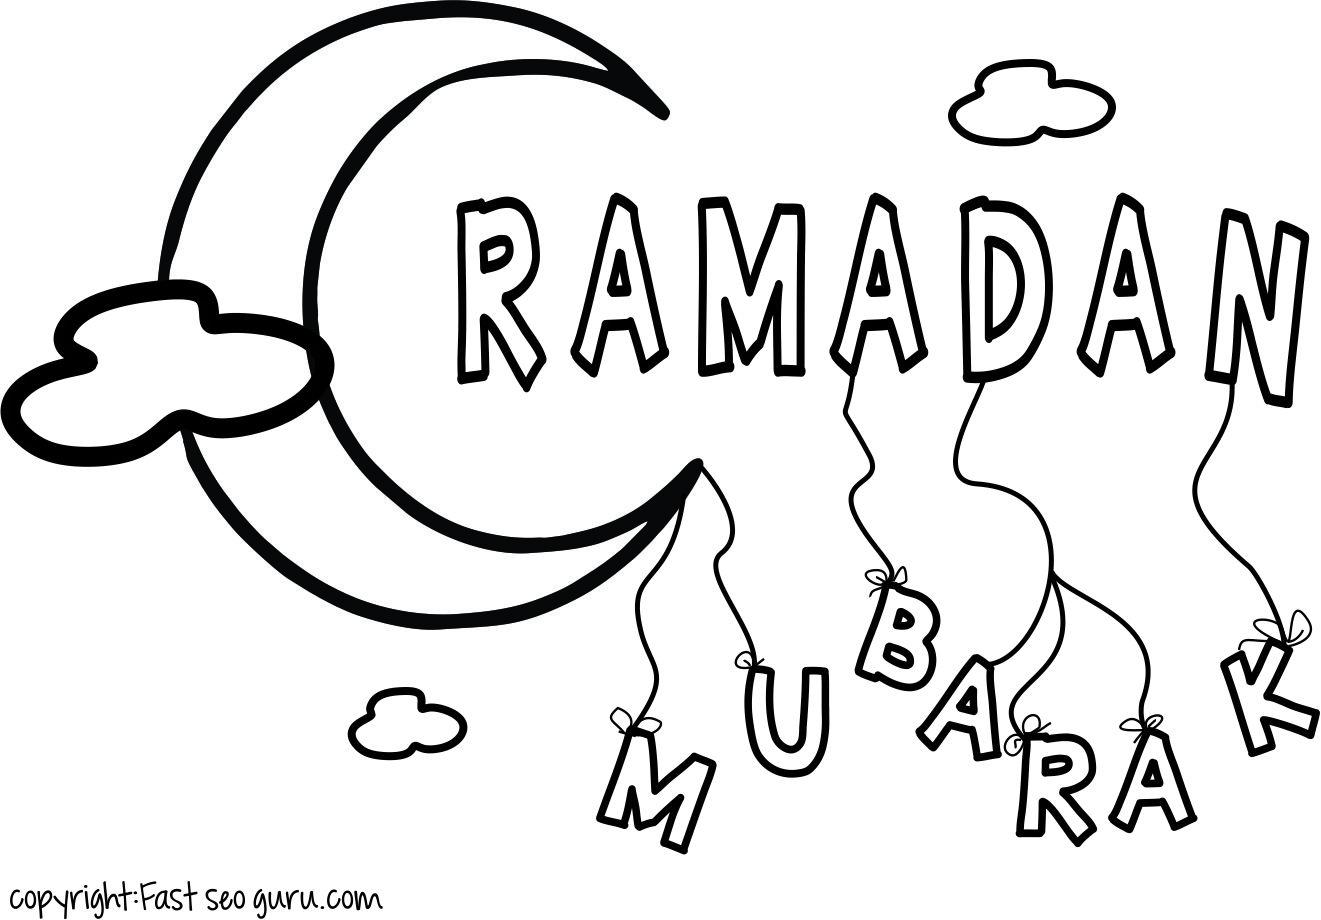 34+ Ramadan mubarak coloring pages information